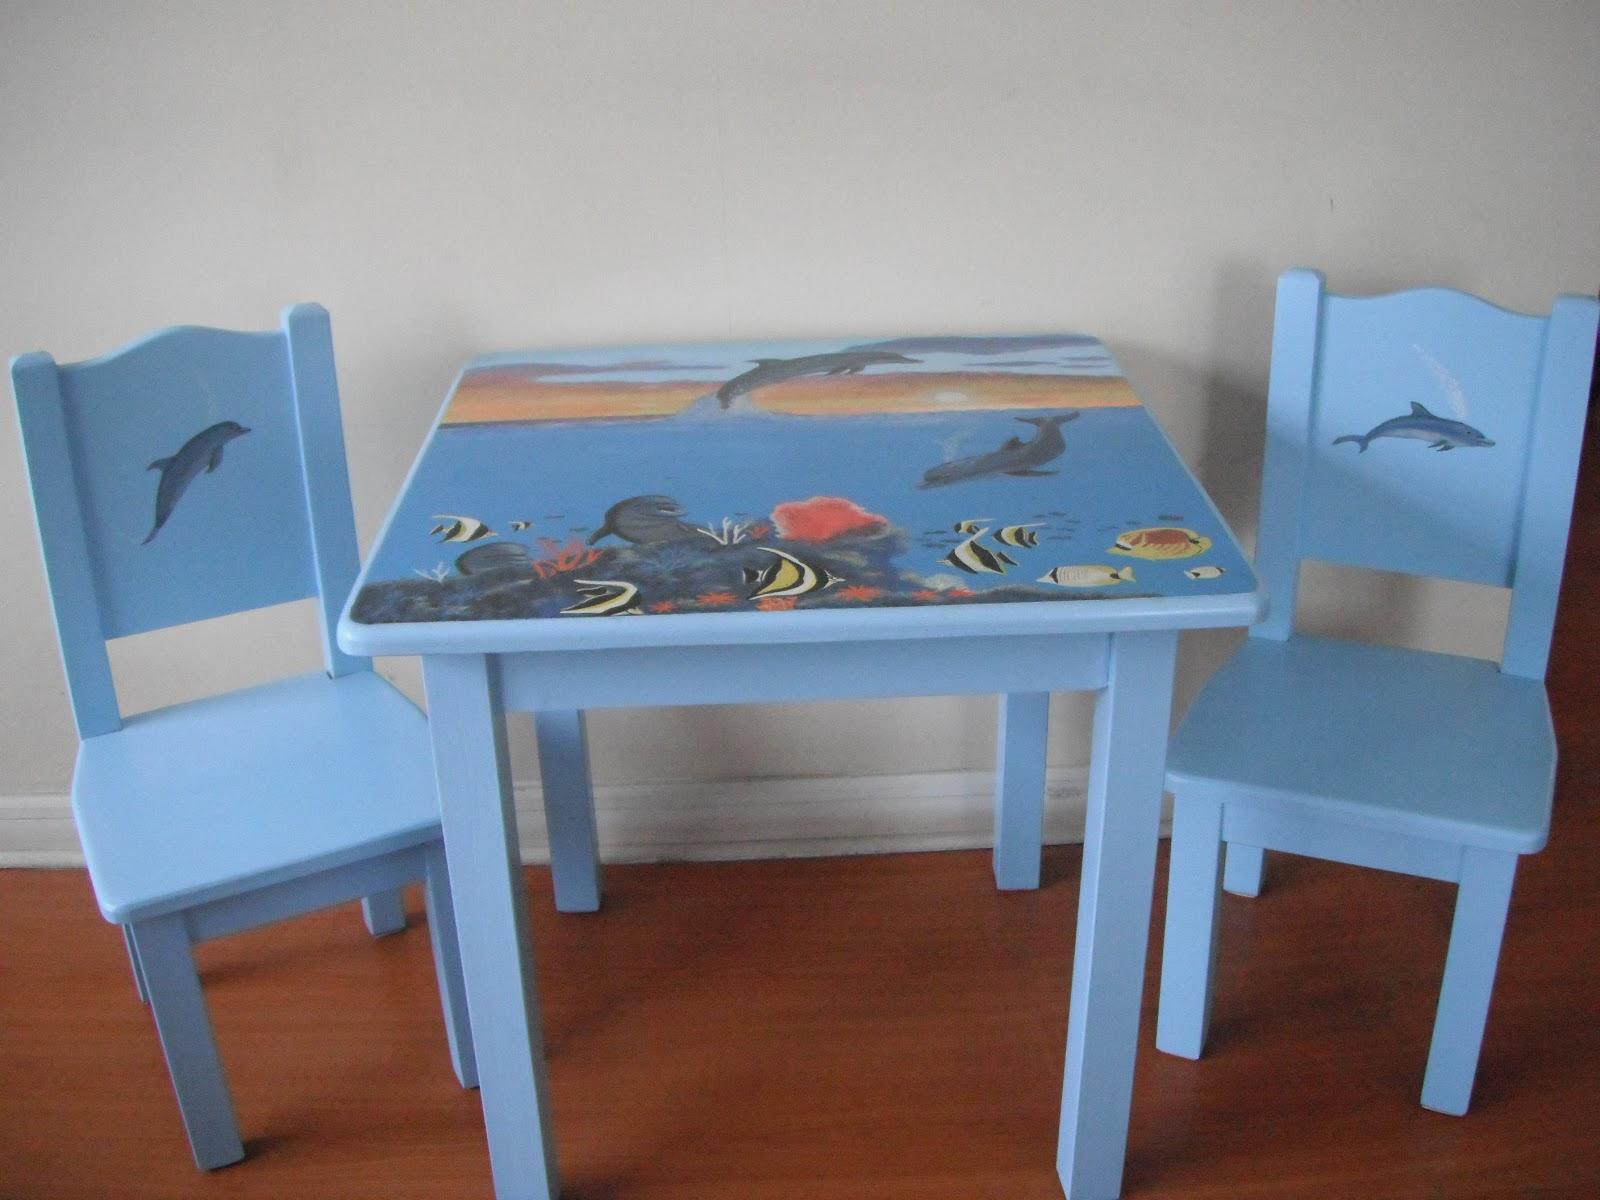 Muebles infantiles decoracin para nios juguetes tejidos